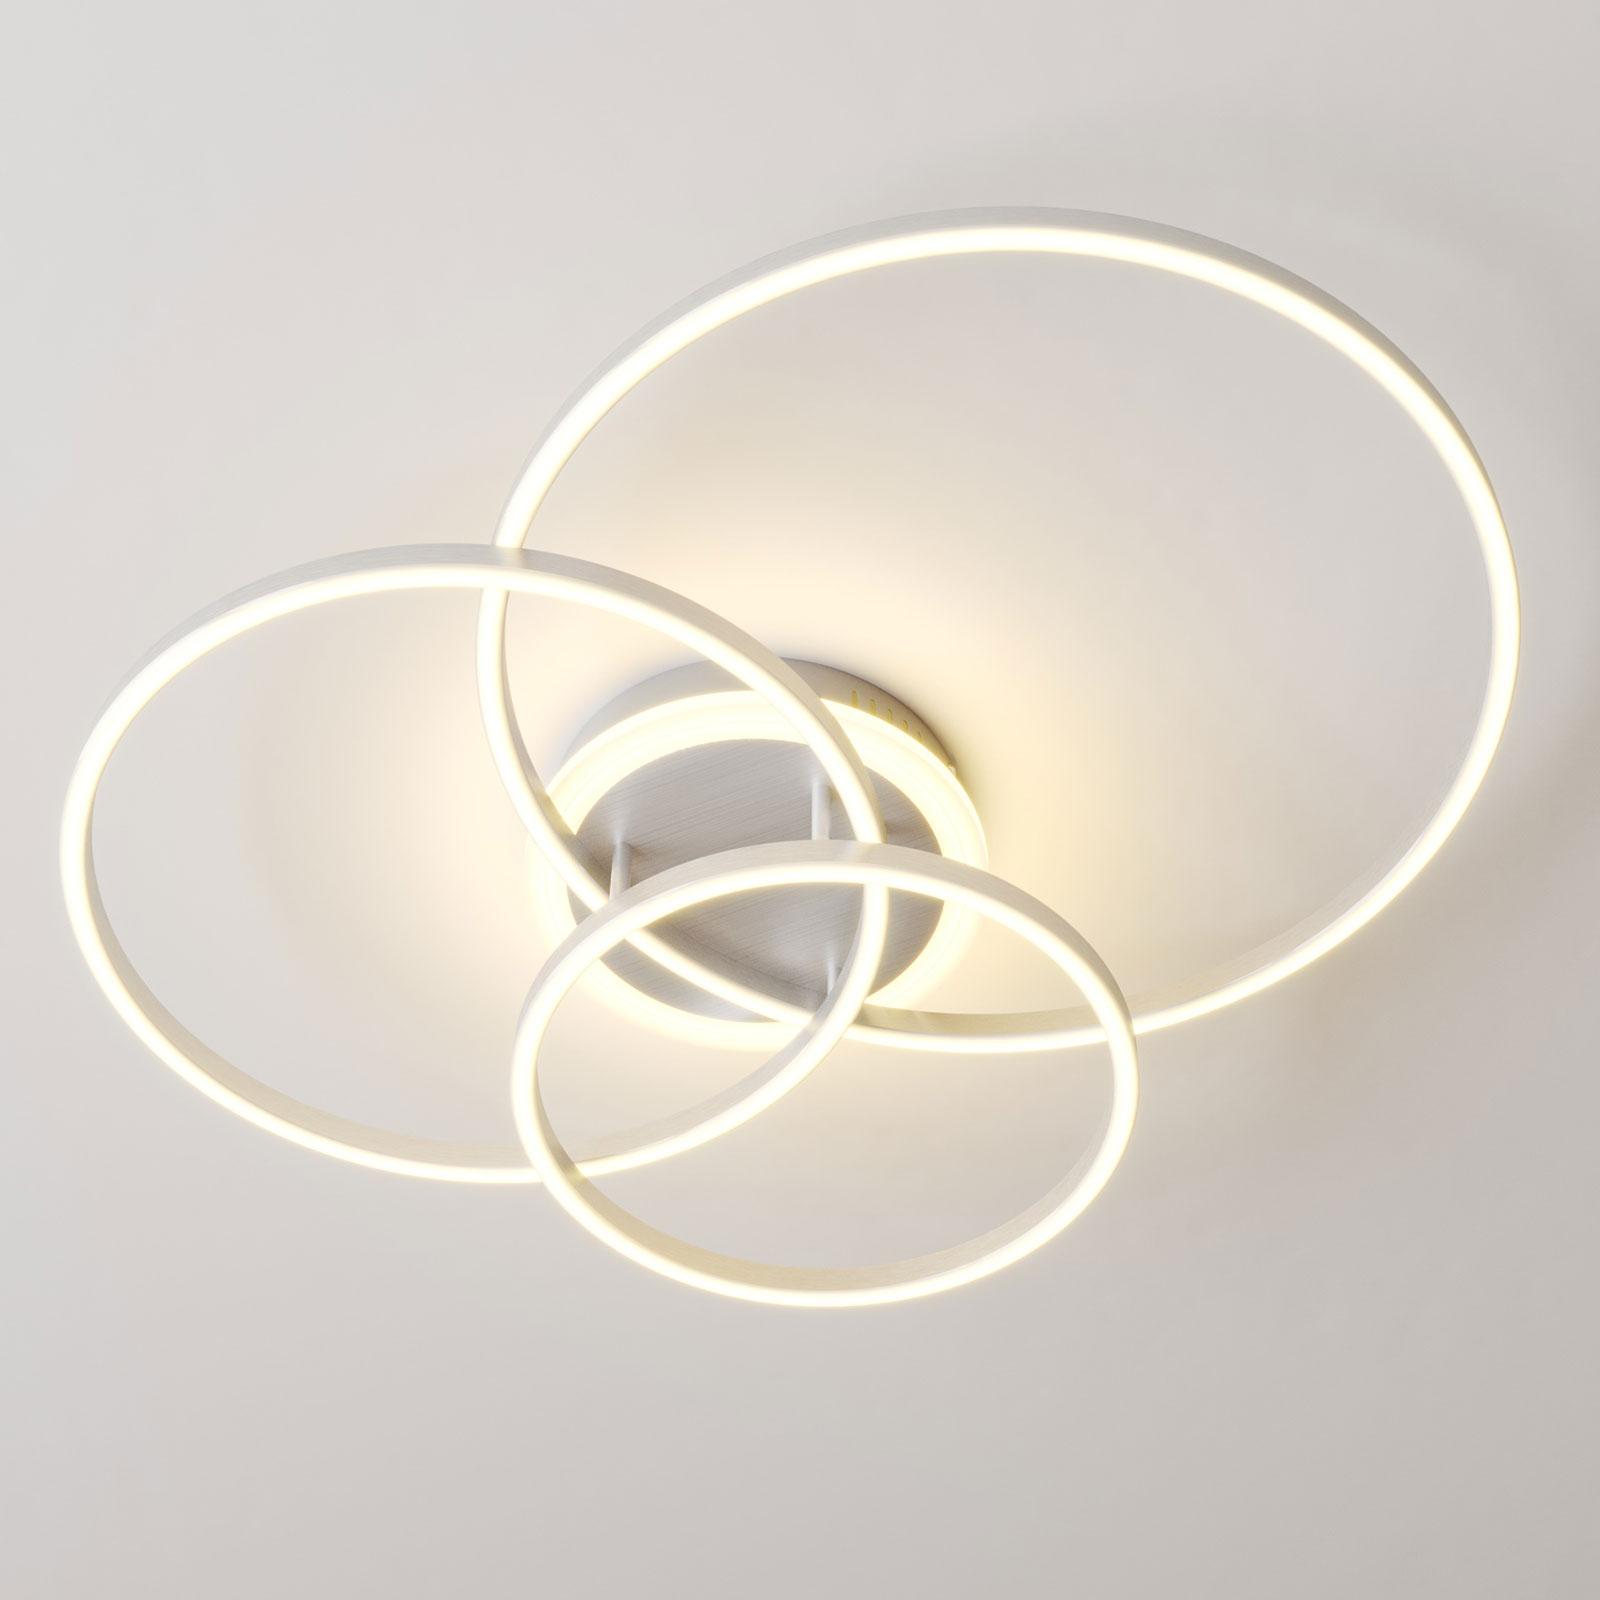 Lindby Smart Tula LED-taklampa